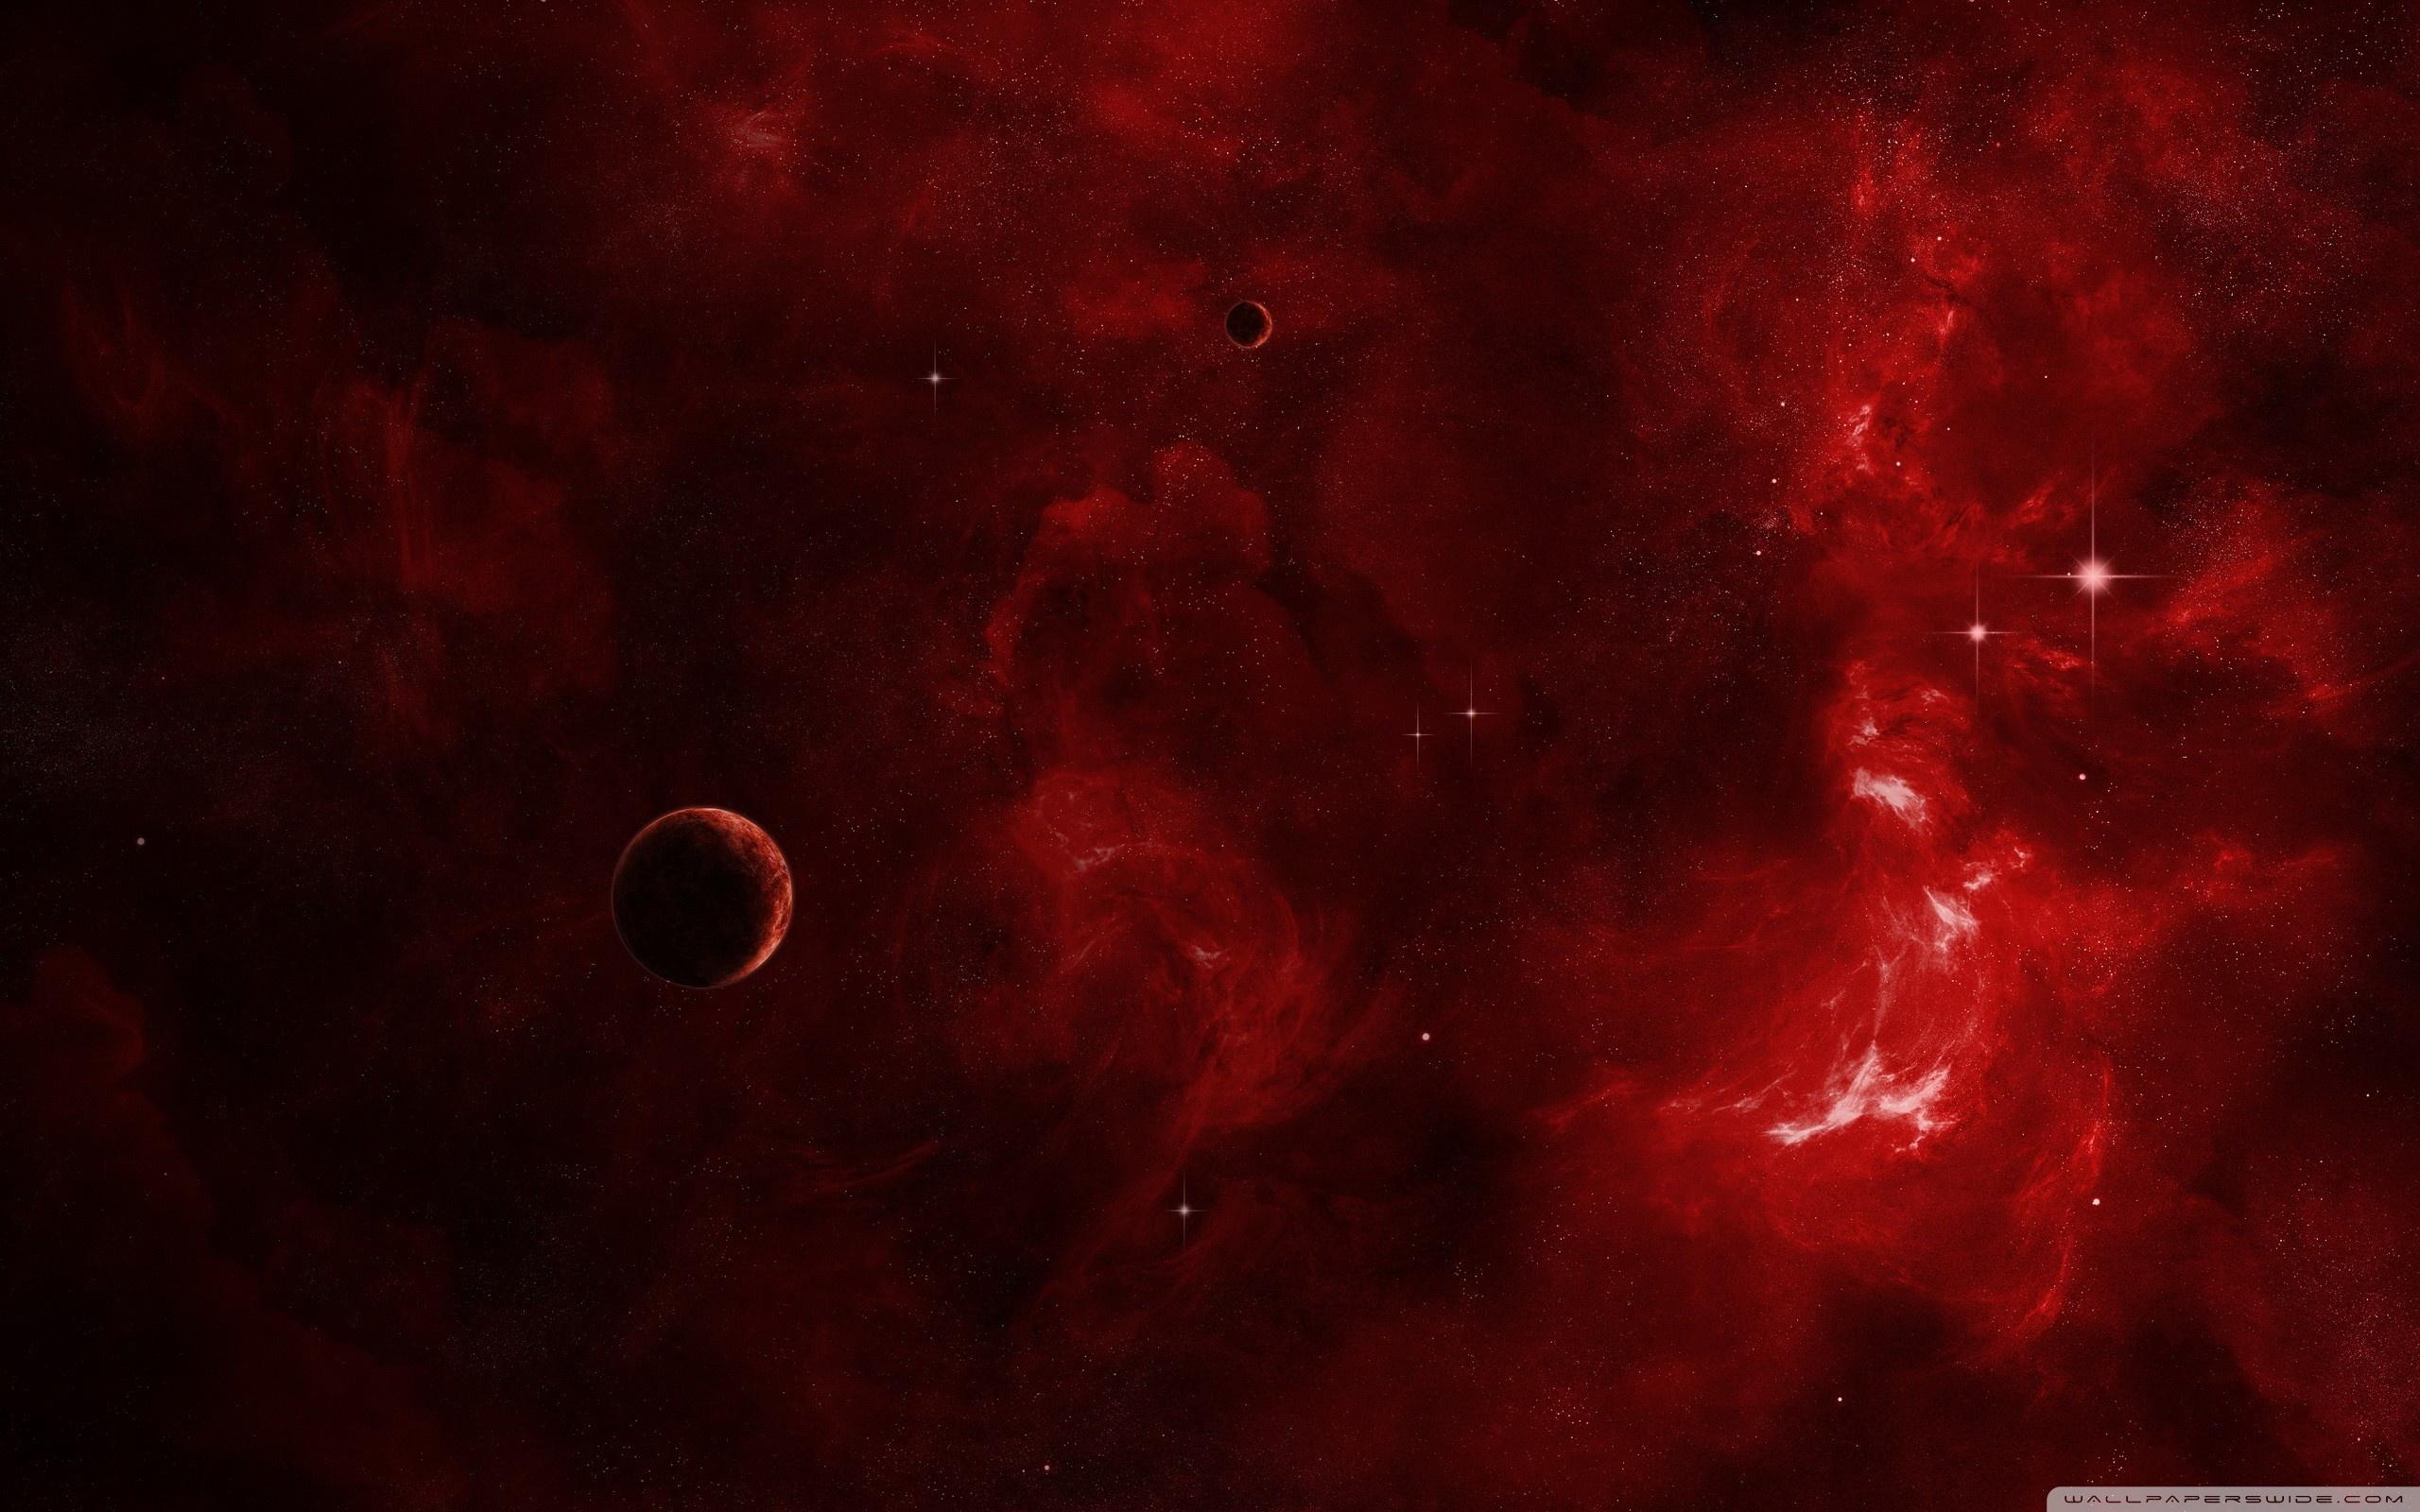 Red galaxy photo